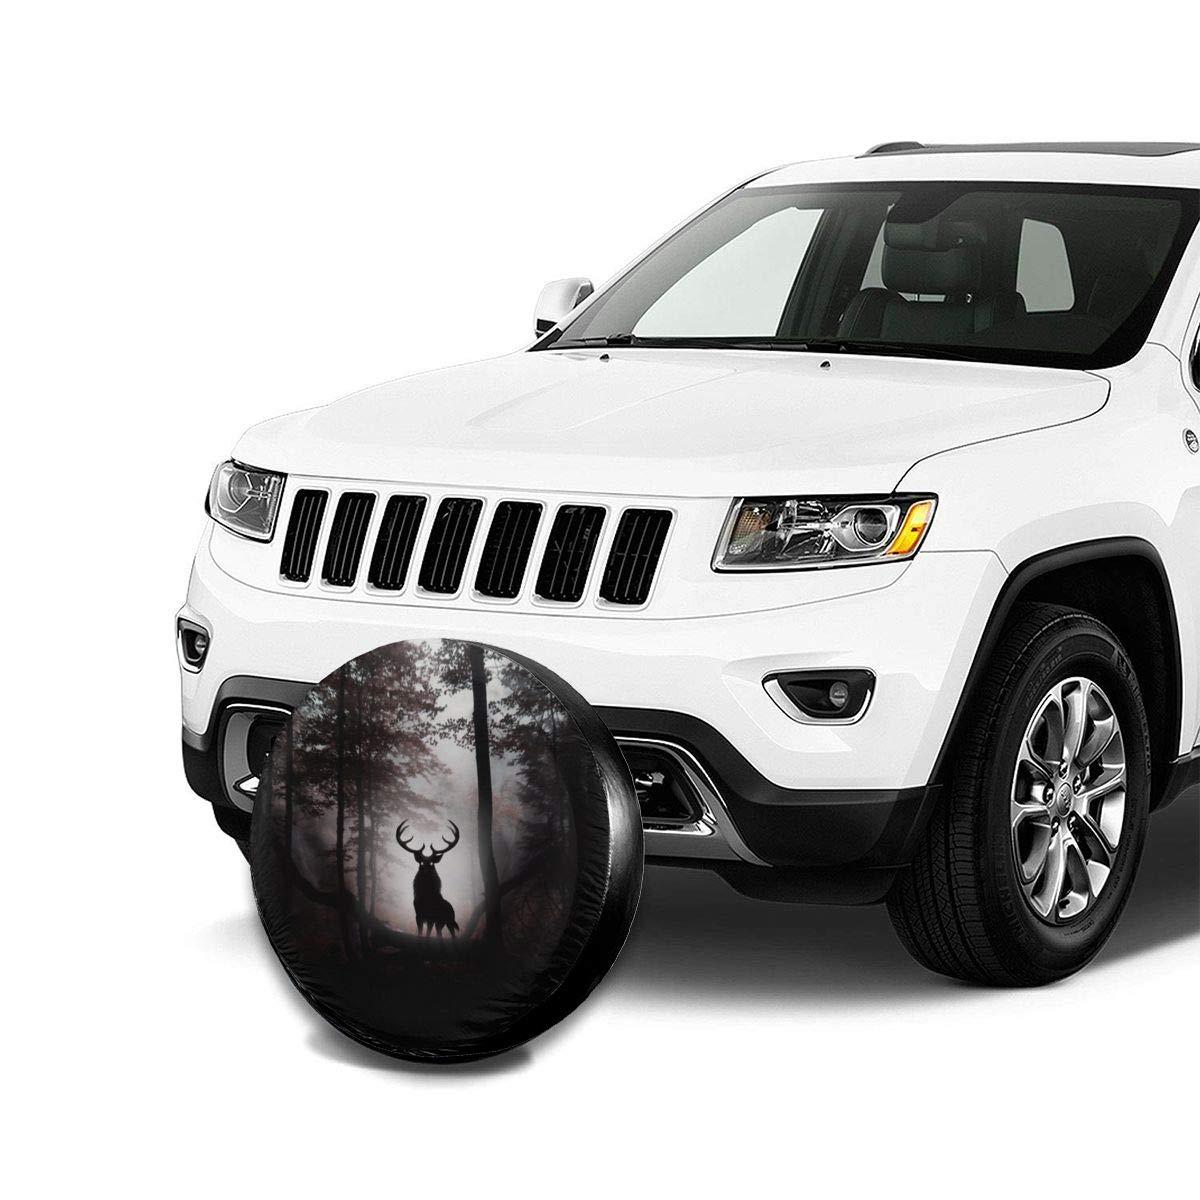 AngShen Deer Fantasy Artwork Spare Tire Wheel Cover Fits Wrangler Jeep Trailer RV SUV Truck Camper Travel Trailer 14,15,16,17 Inch